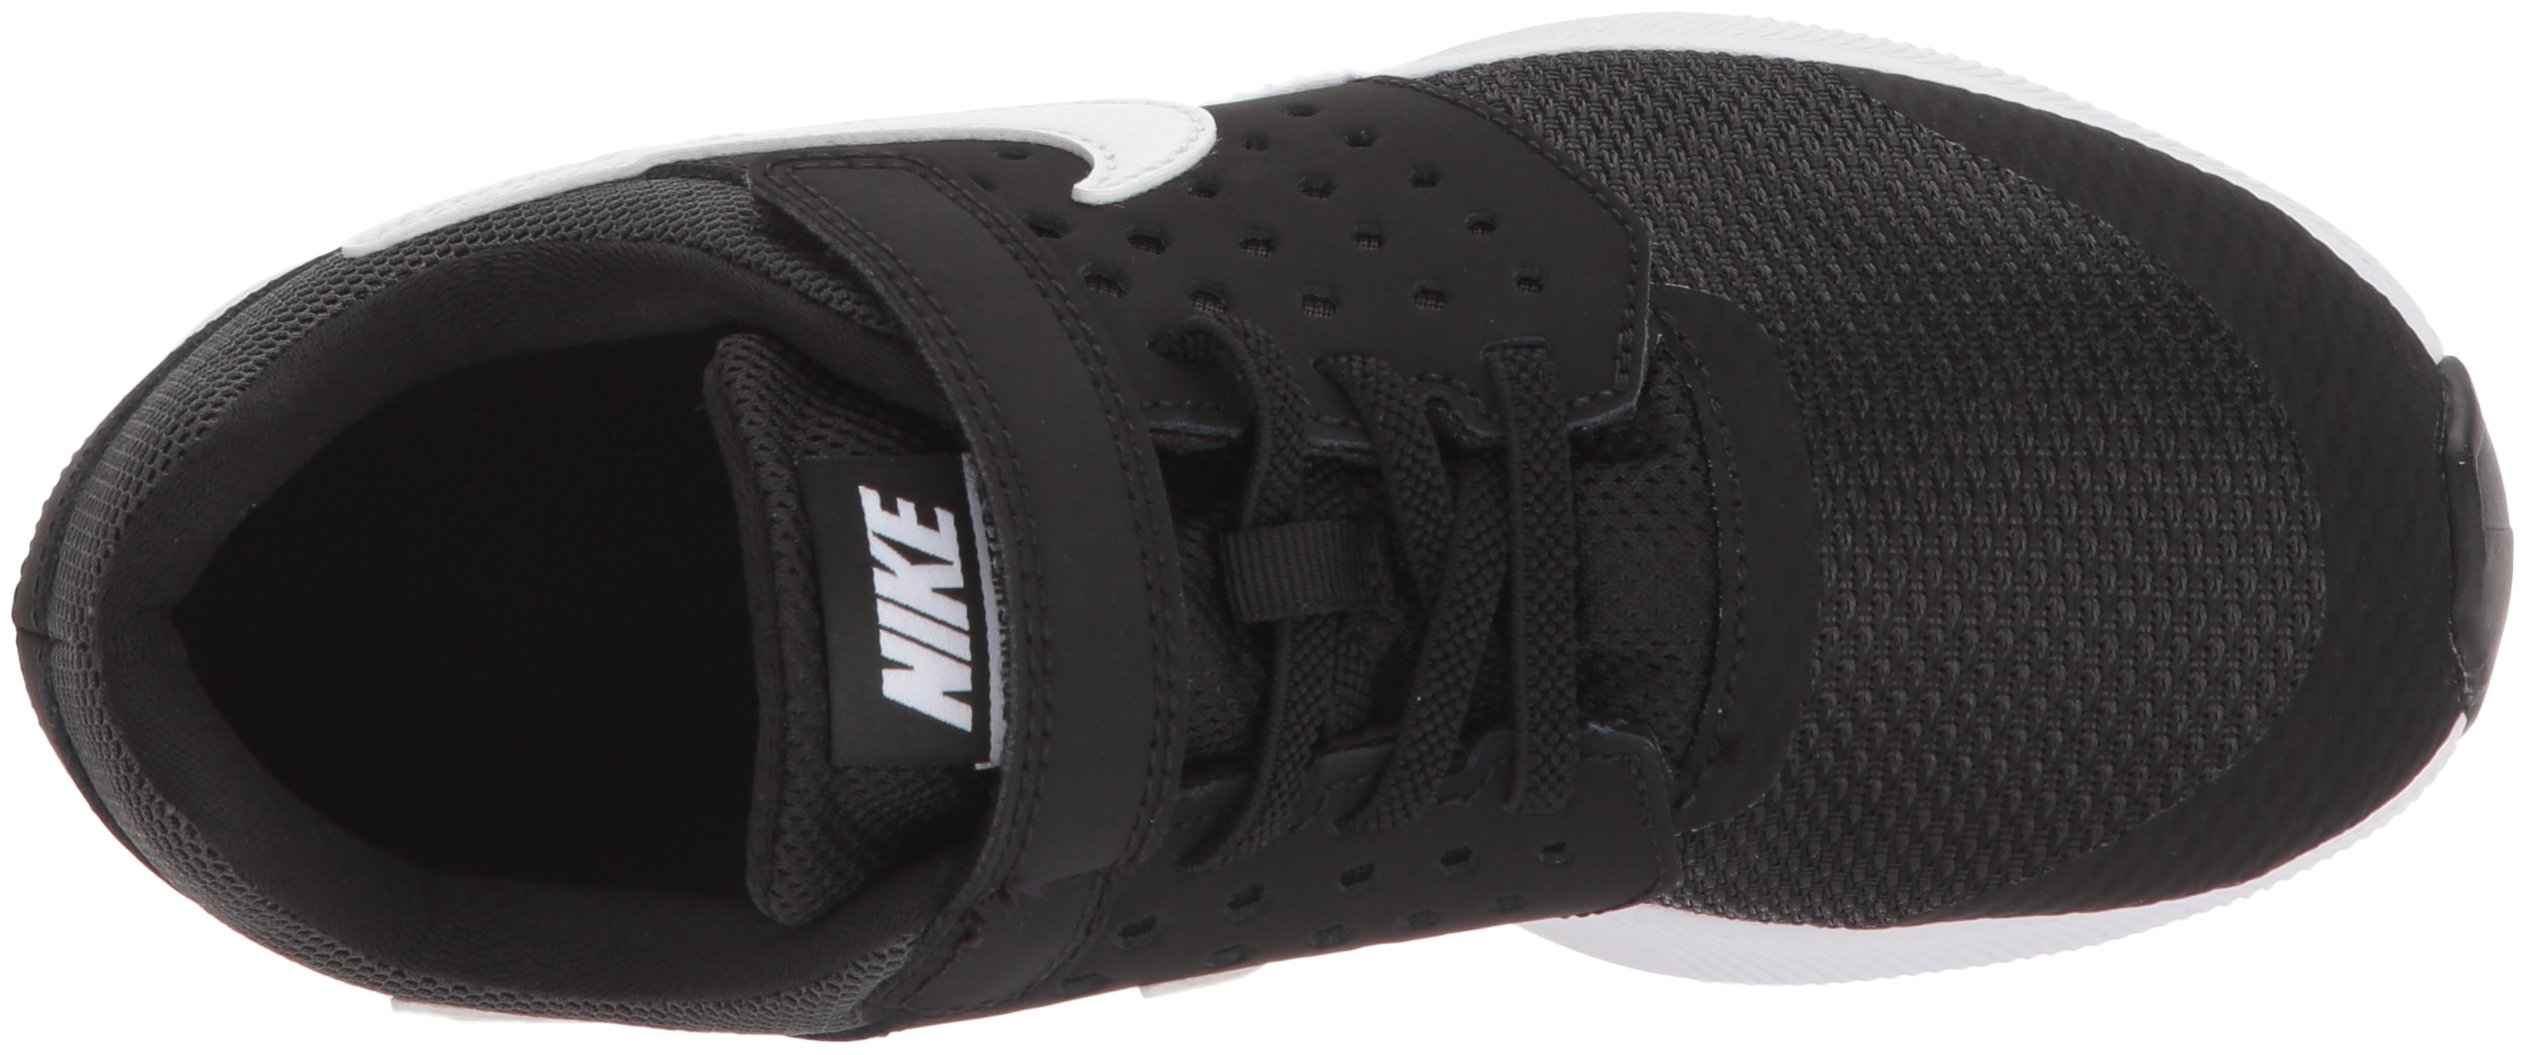 Nike Boys' Downshifter 7 (PSV) Running Shoe, Black/White-Anthracite, 3 M US Little Kid by Nike (Image #7)